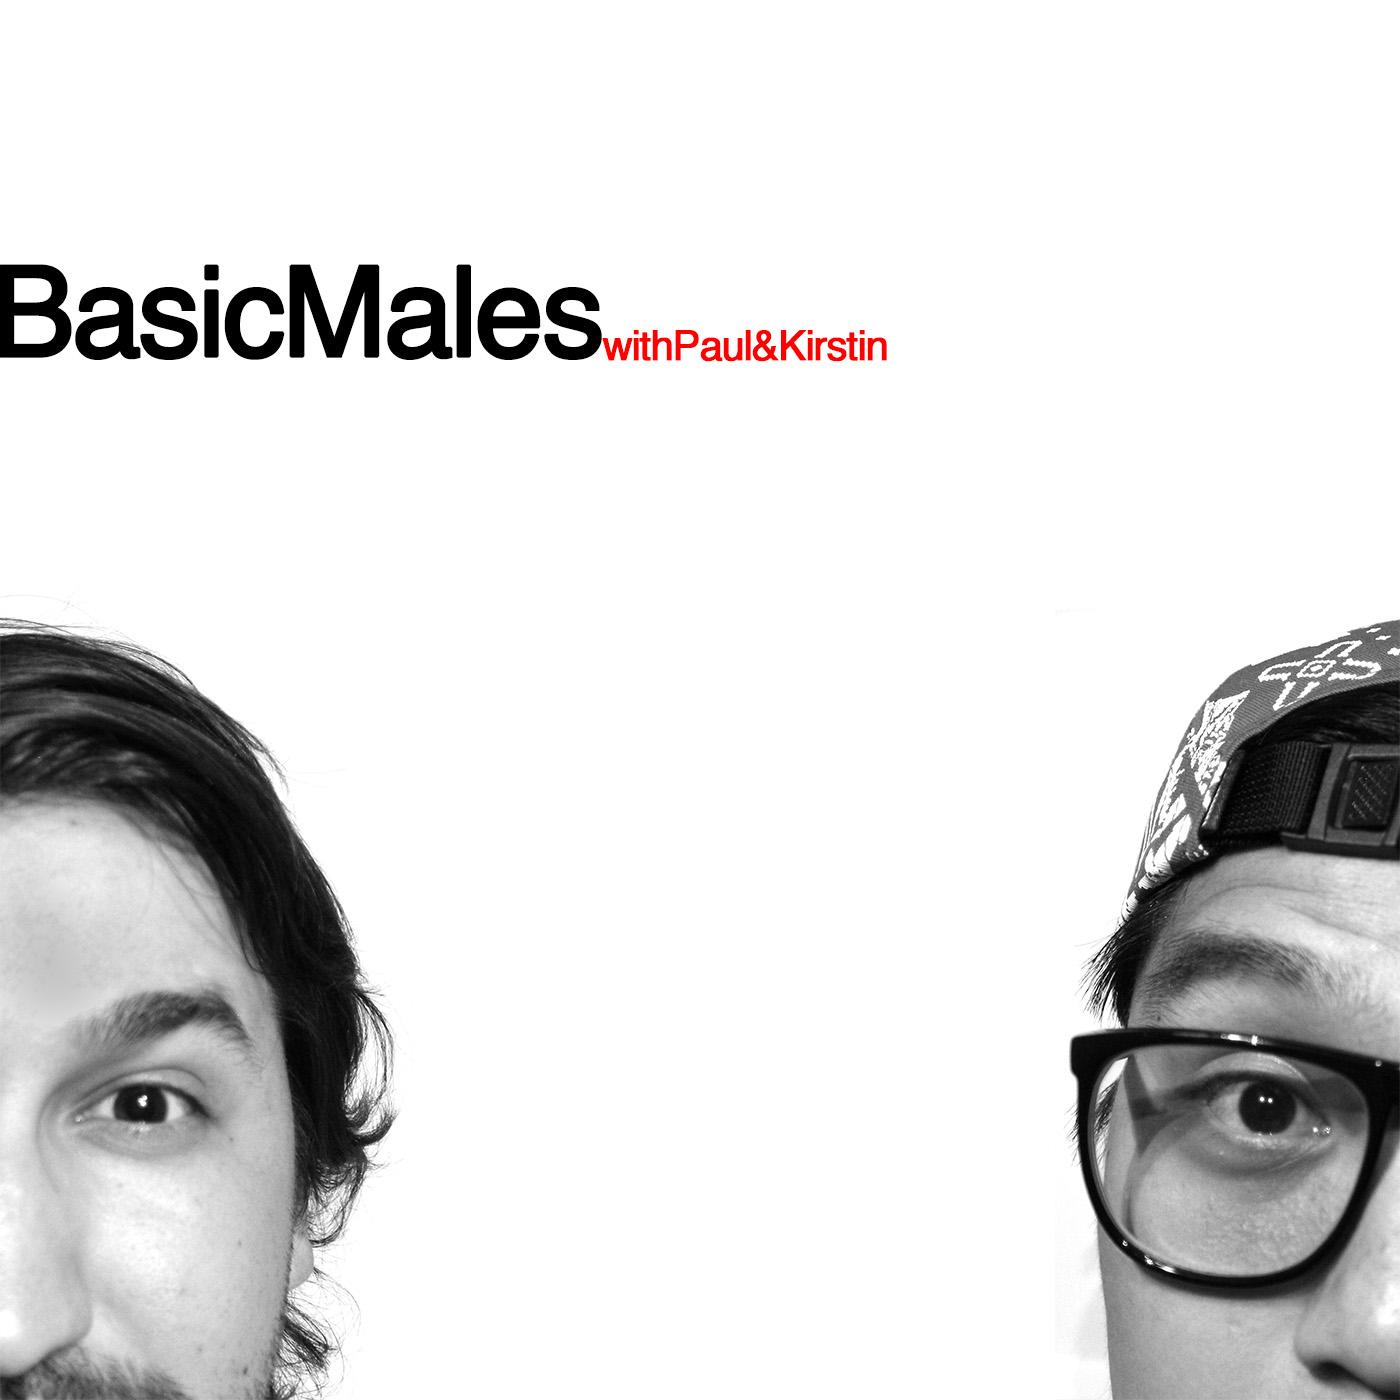 basicmales